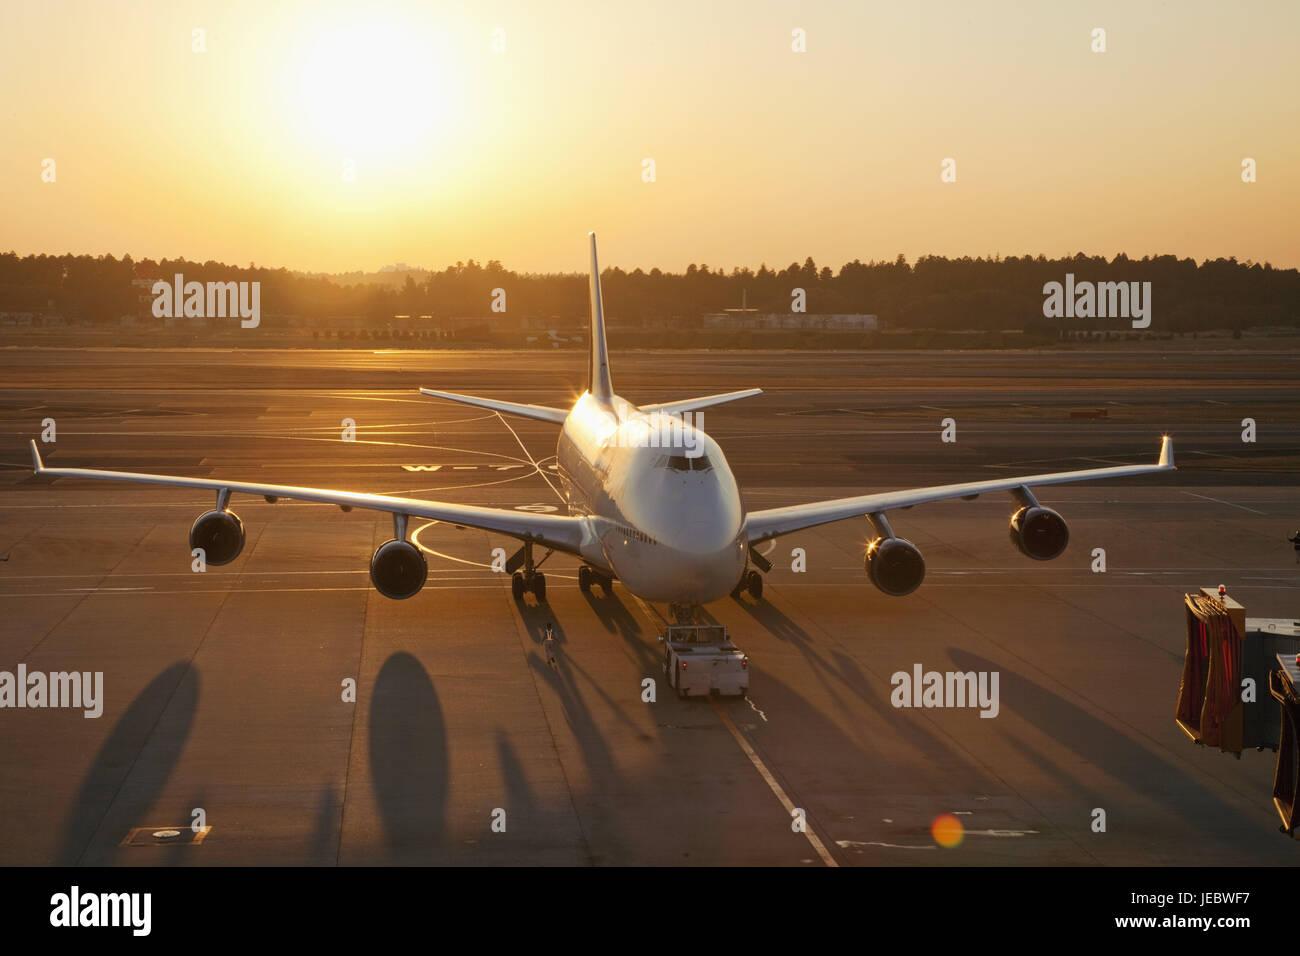 Japon, Tokyo, l'aéroport international de Narita, terrain d'atterrissage, avion, lumière du soir, Photo Stock